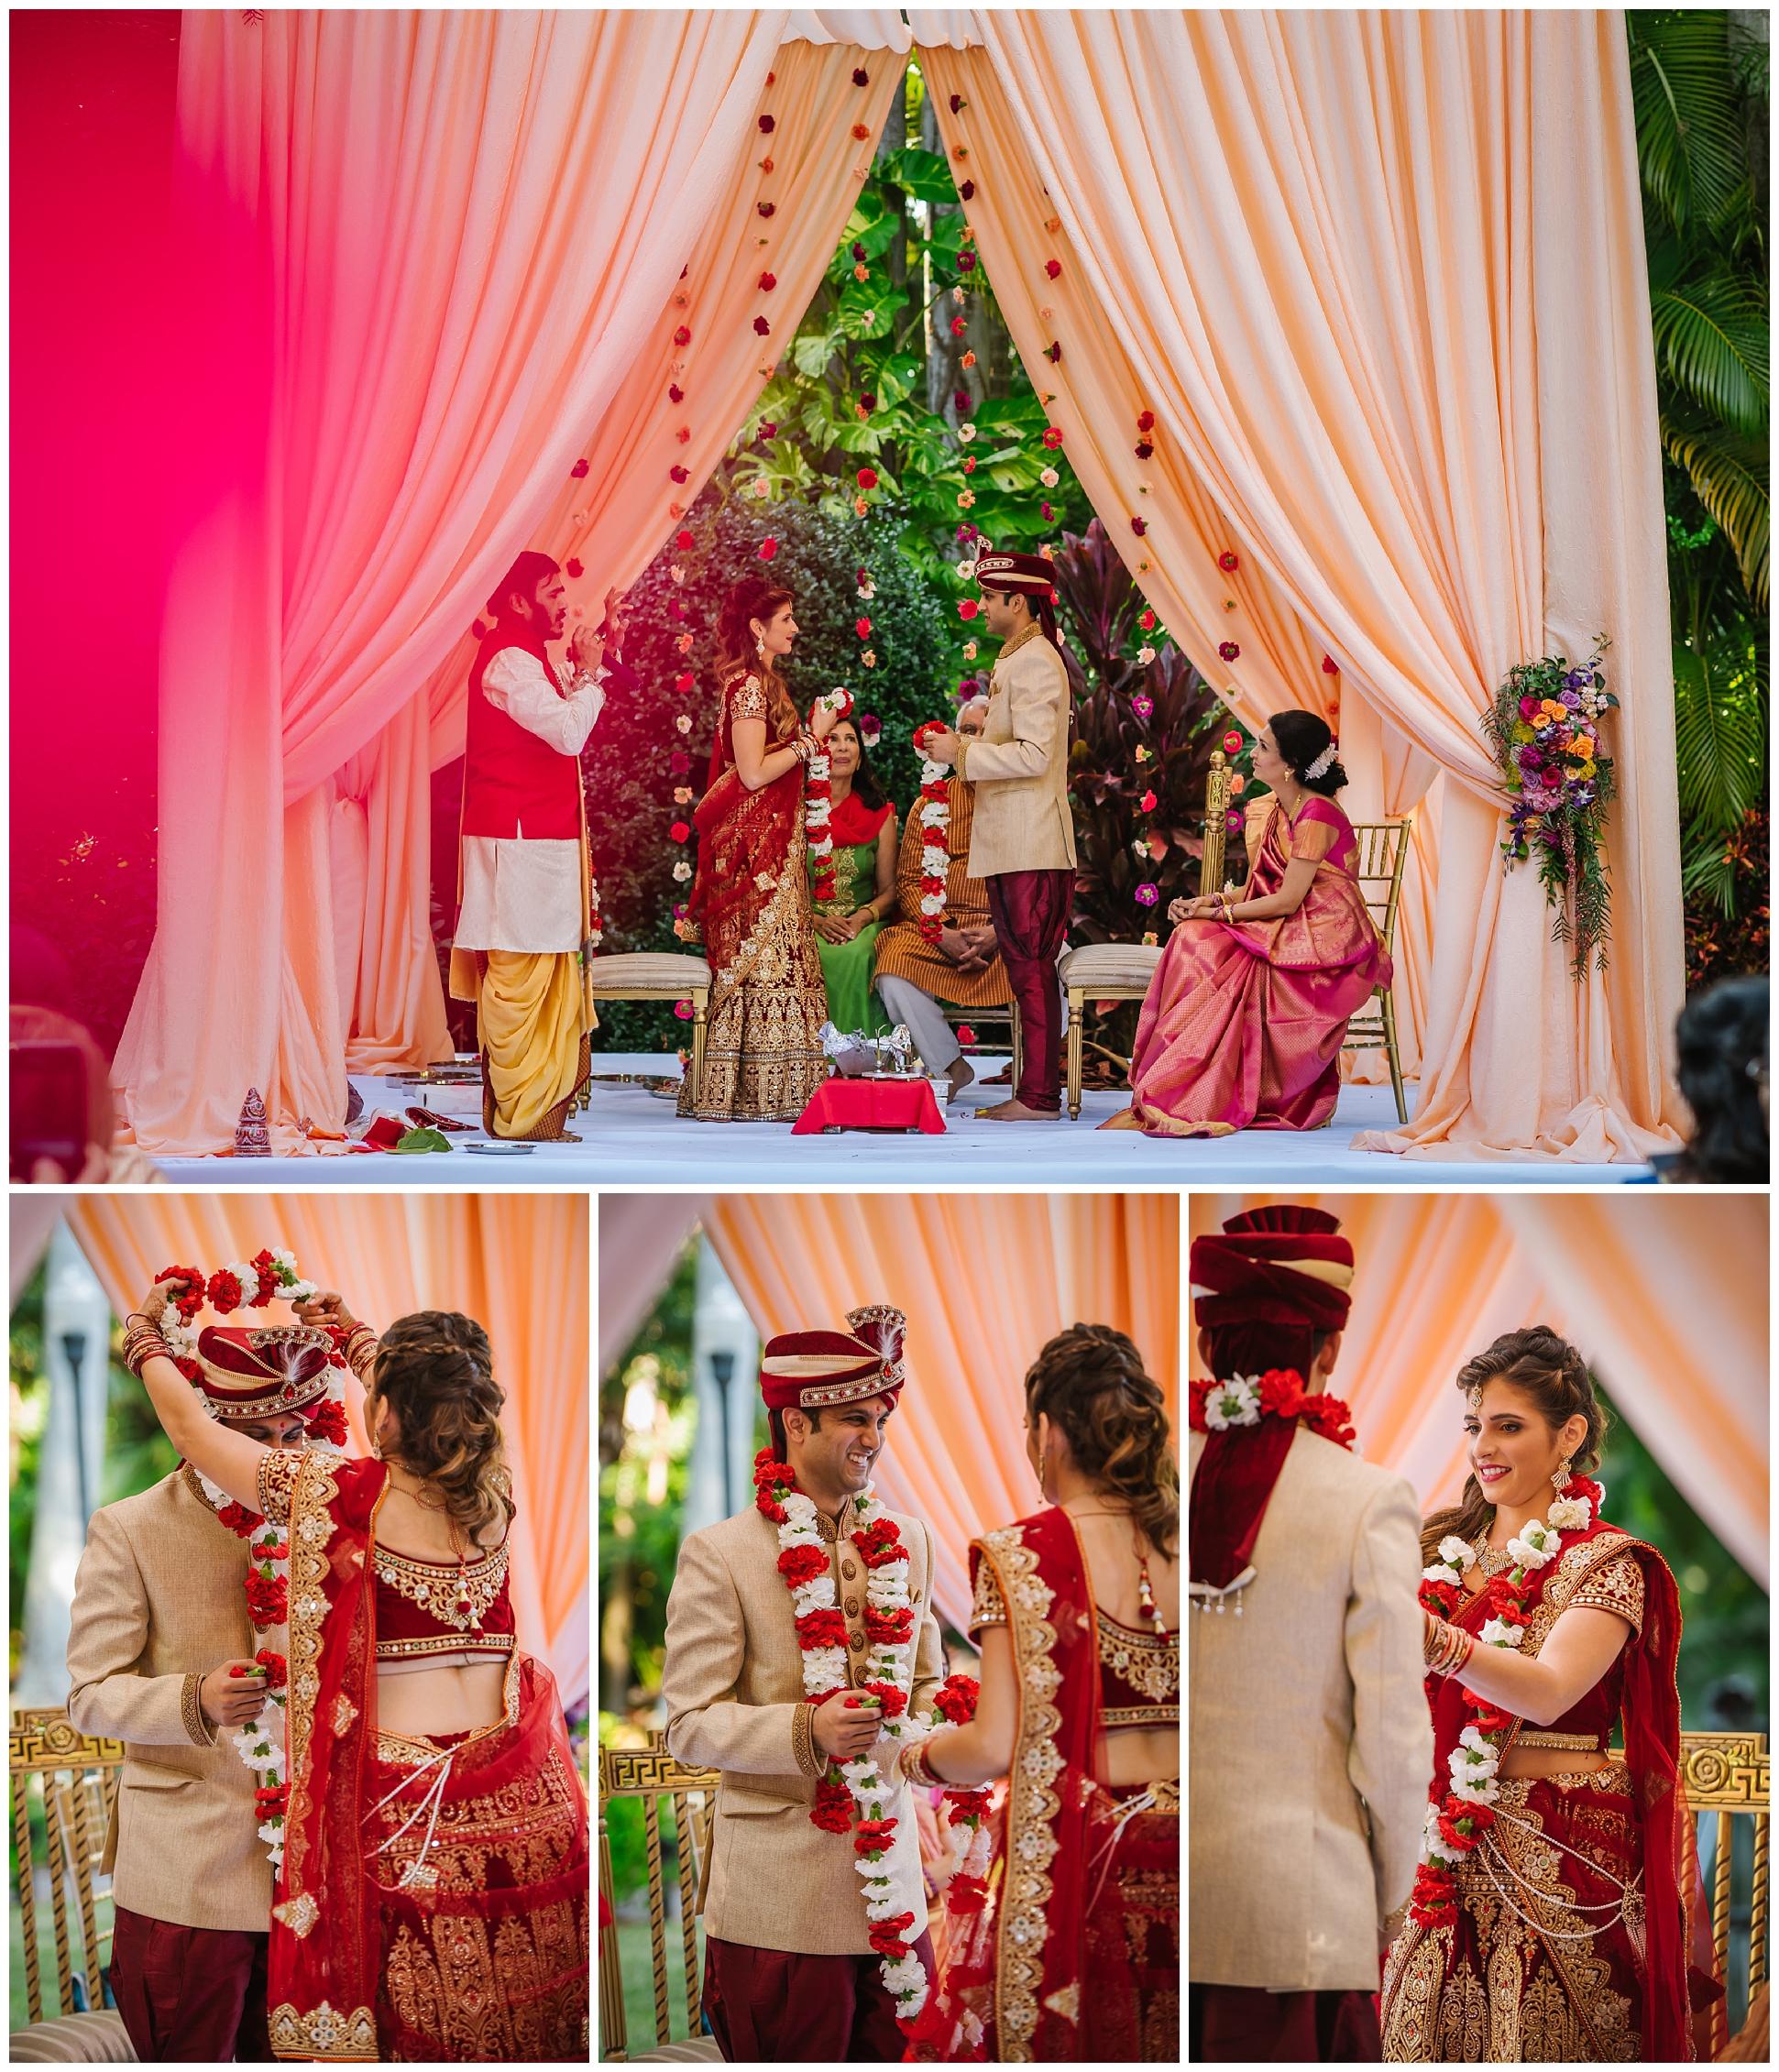 St-pete-indian-wedding-photographer-barat-sunken-gardens_0111.jpg